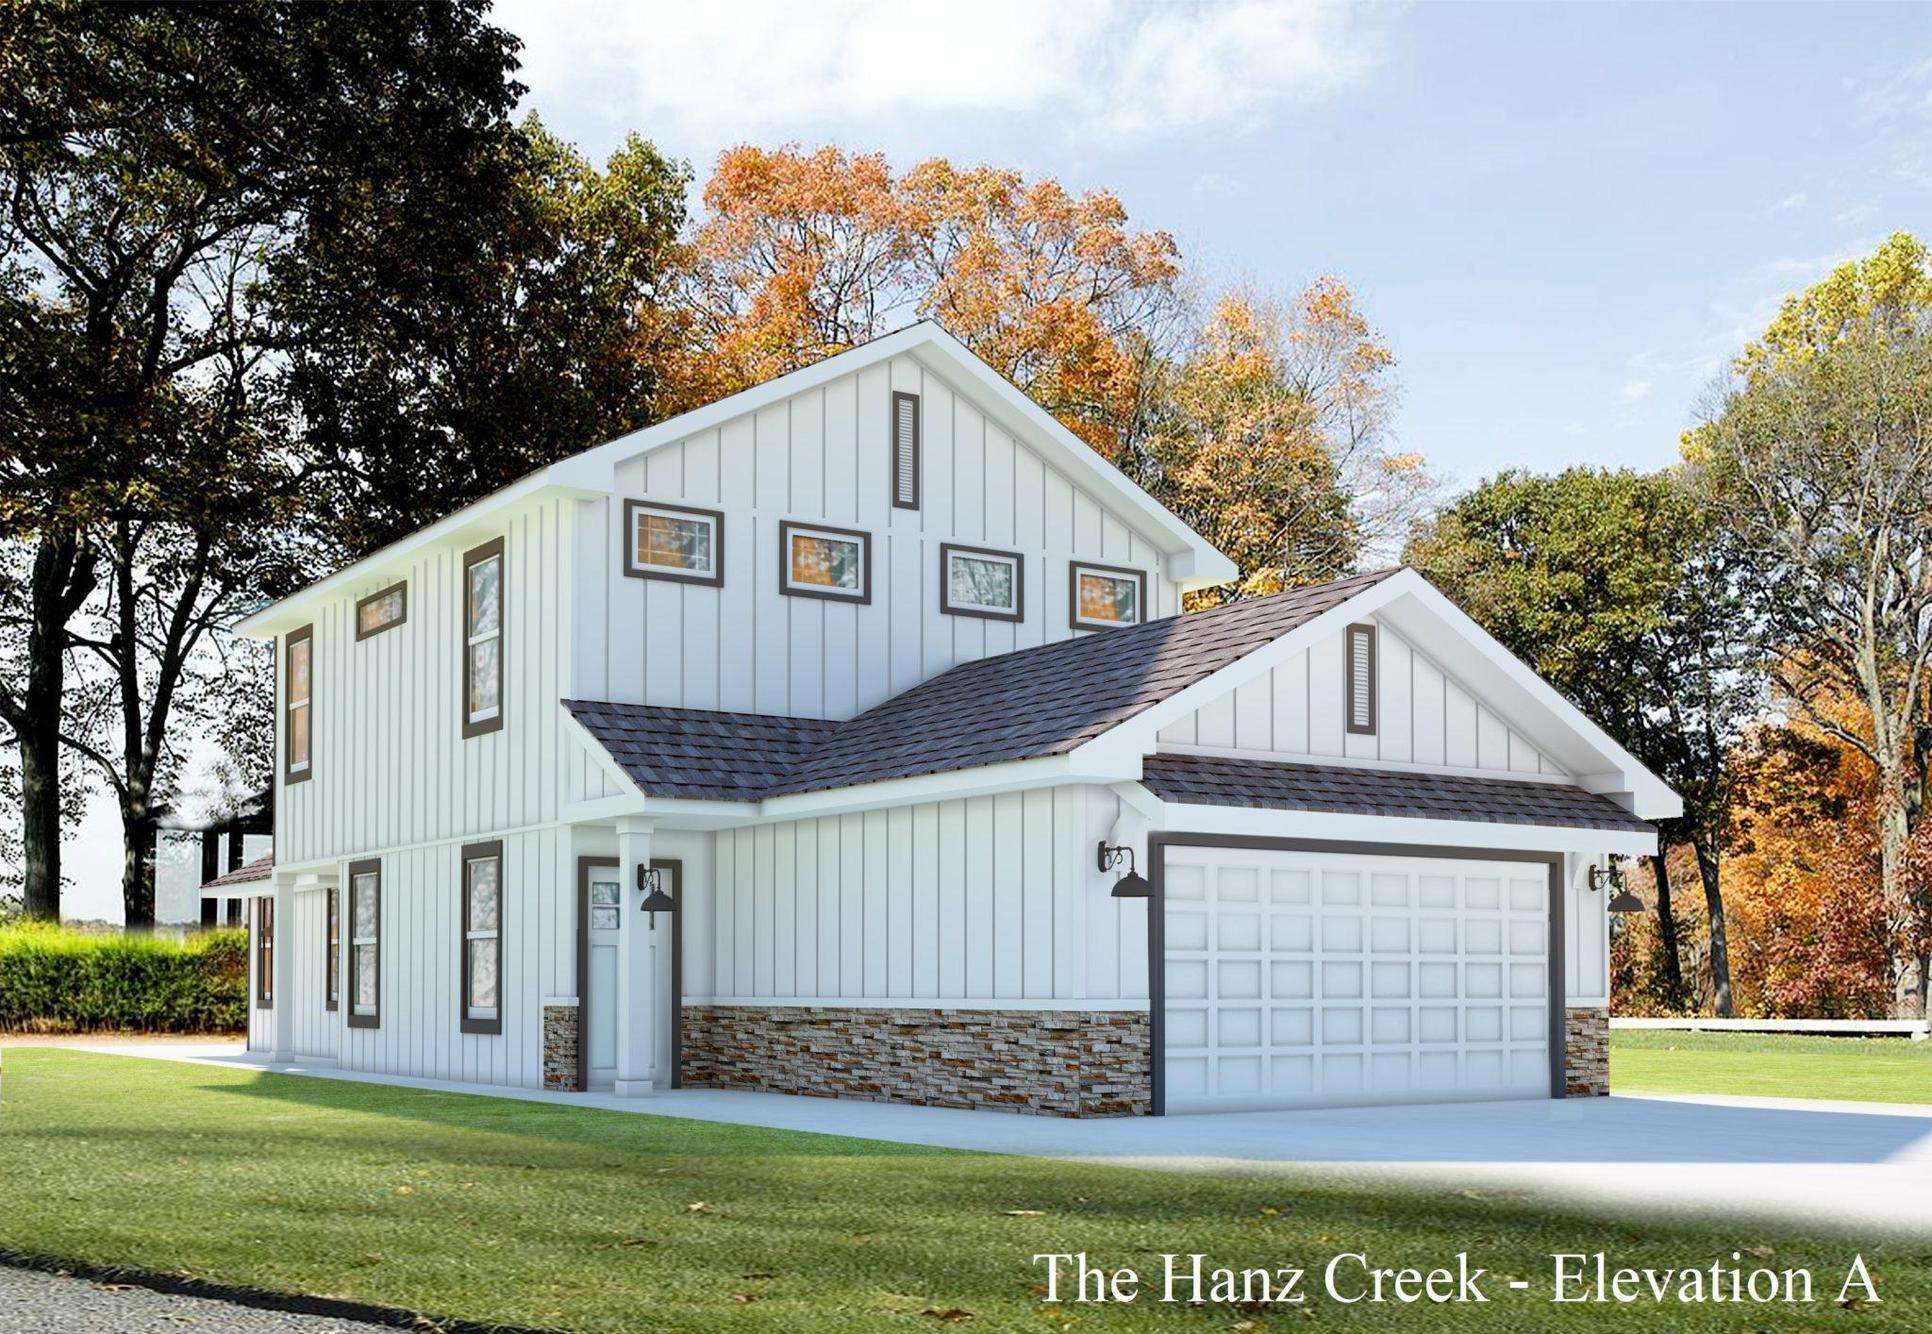 Hanz Creek Elevation A:Hanz Creek Elevation A